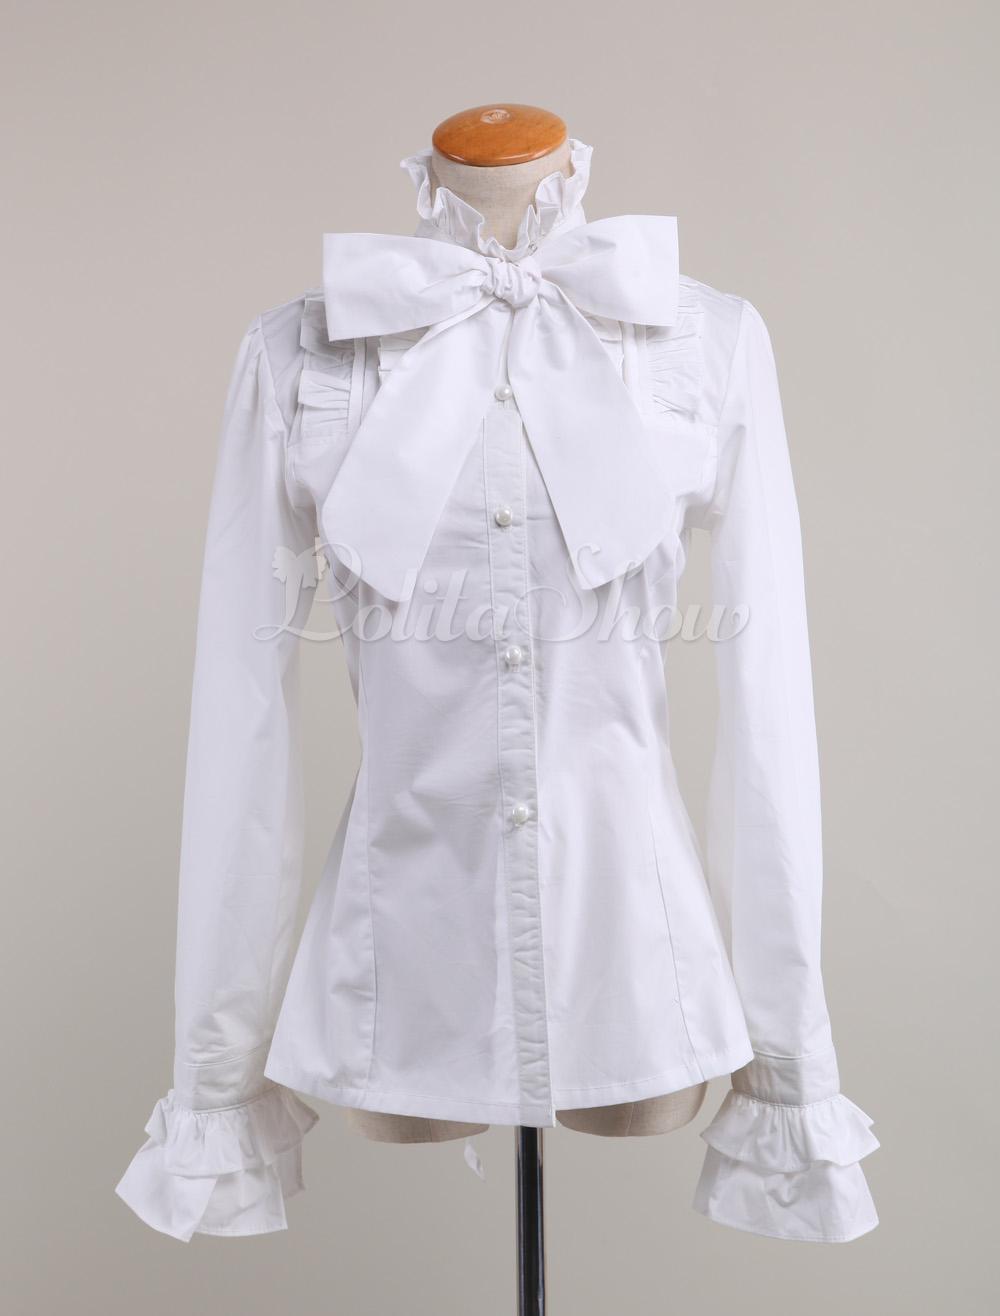 107f810fc2d03 Lolitashow White Cotton Lolita Blouse Long Sleeves Stand Collar Bow Ruffles  - Lolitashow.com